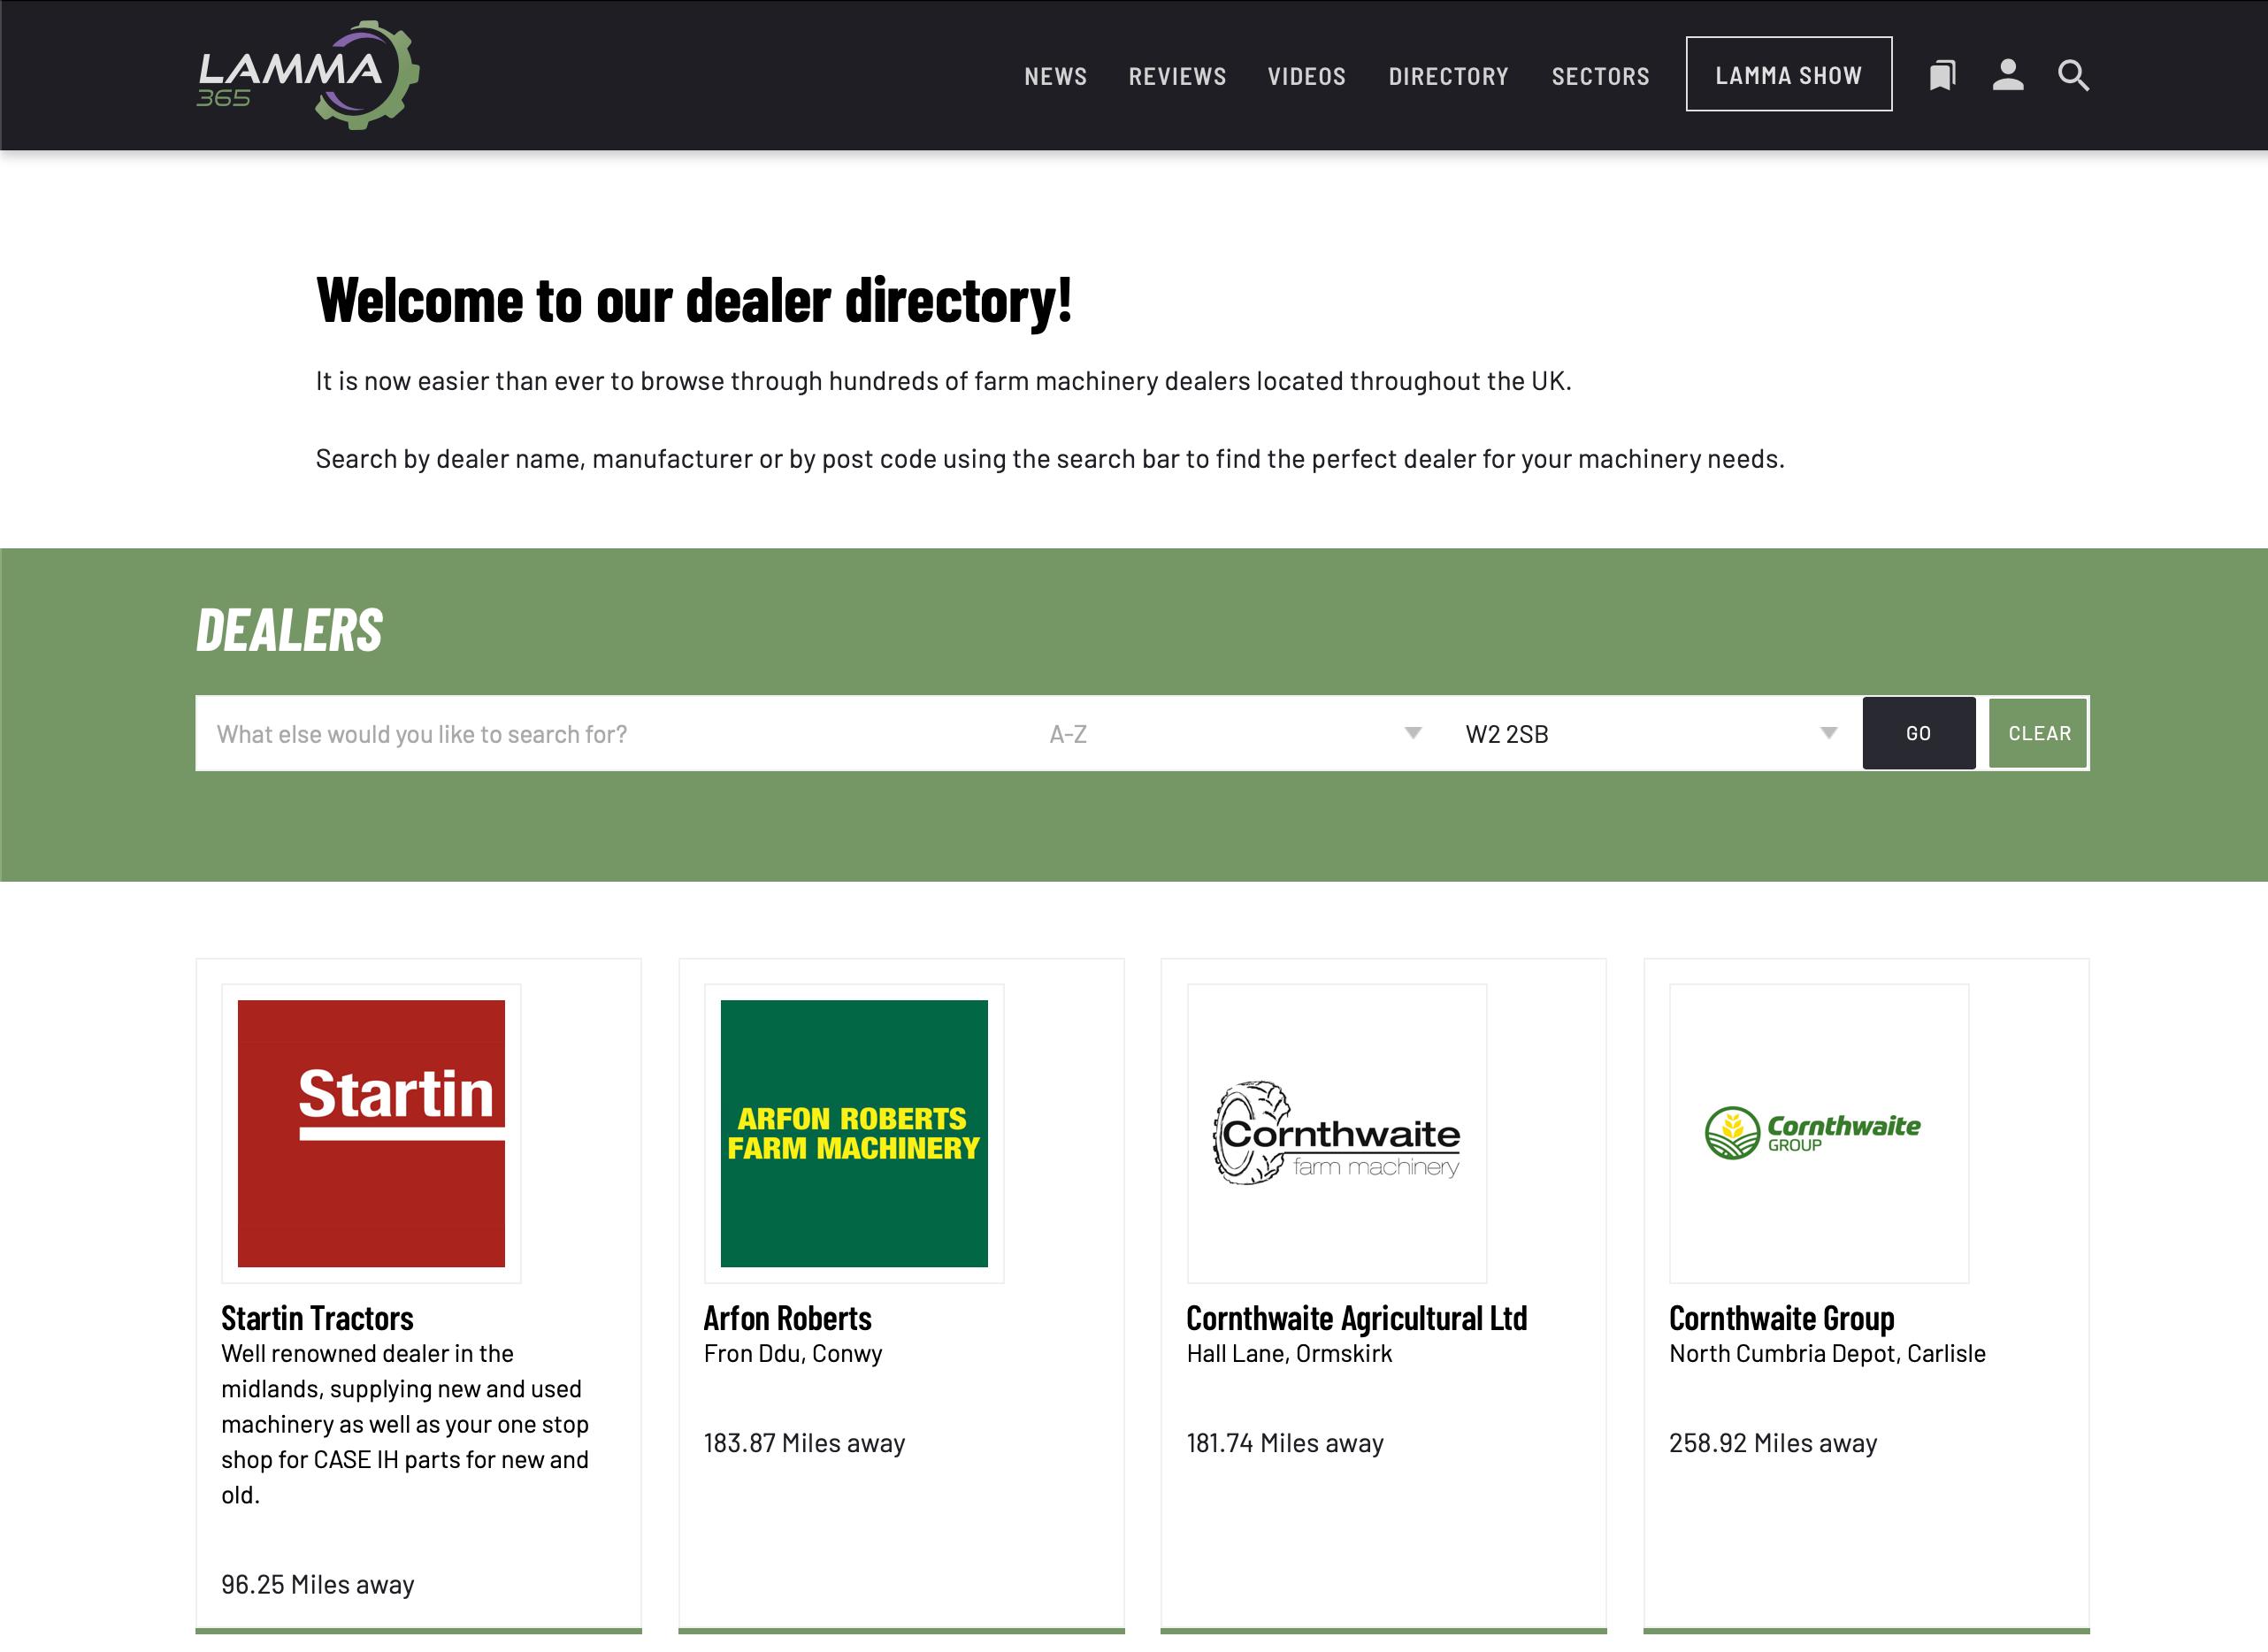 Lamma Dealer Directory